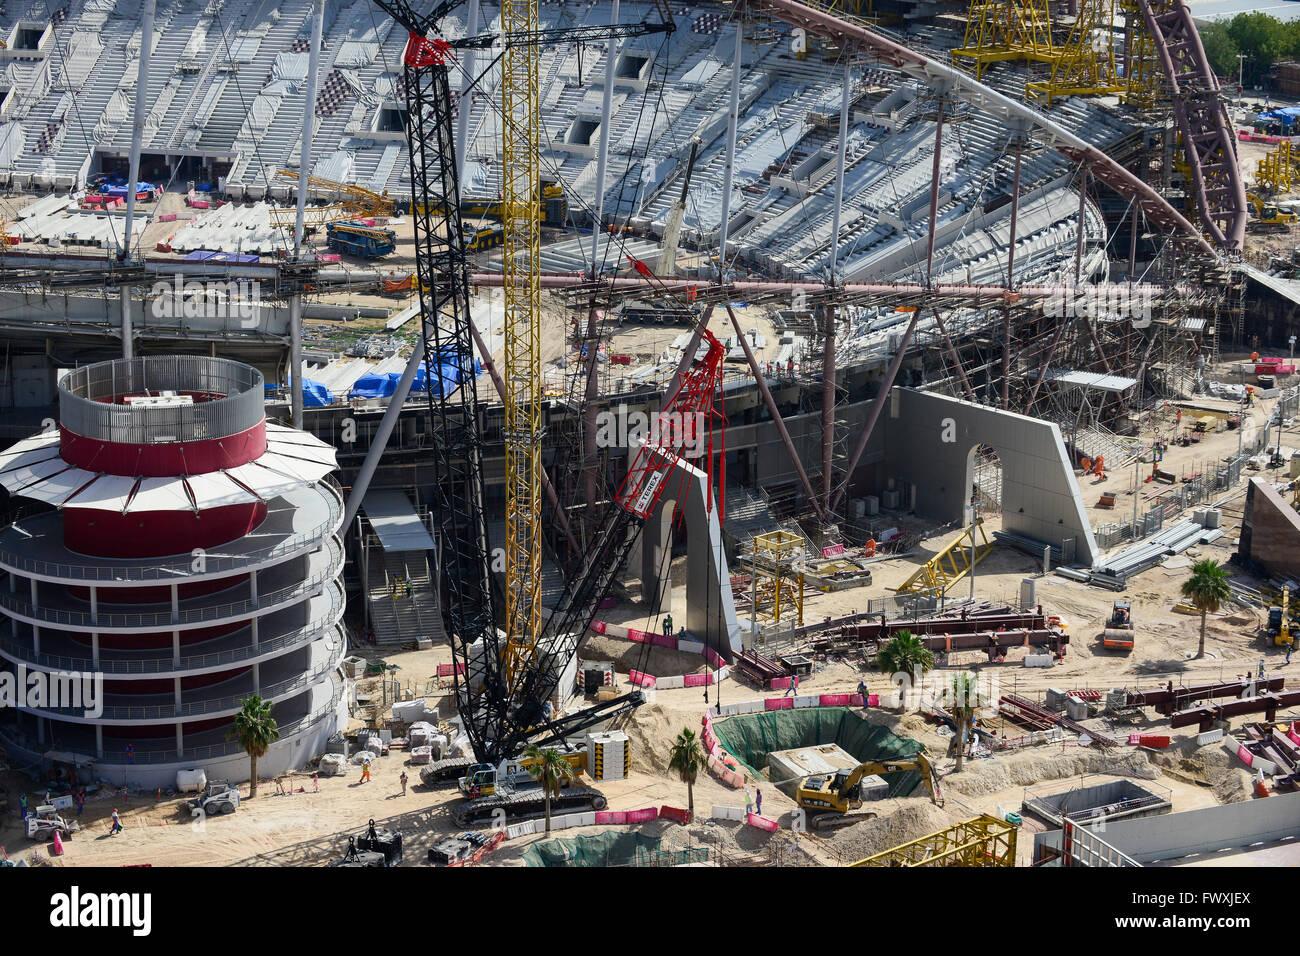 QATAR, Doha, construction site Khalifa International Stadium for FIFA world cup 2022, built by contractor midmac - Stock Image